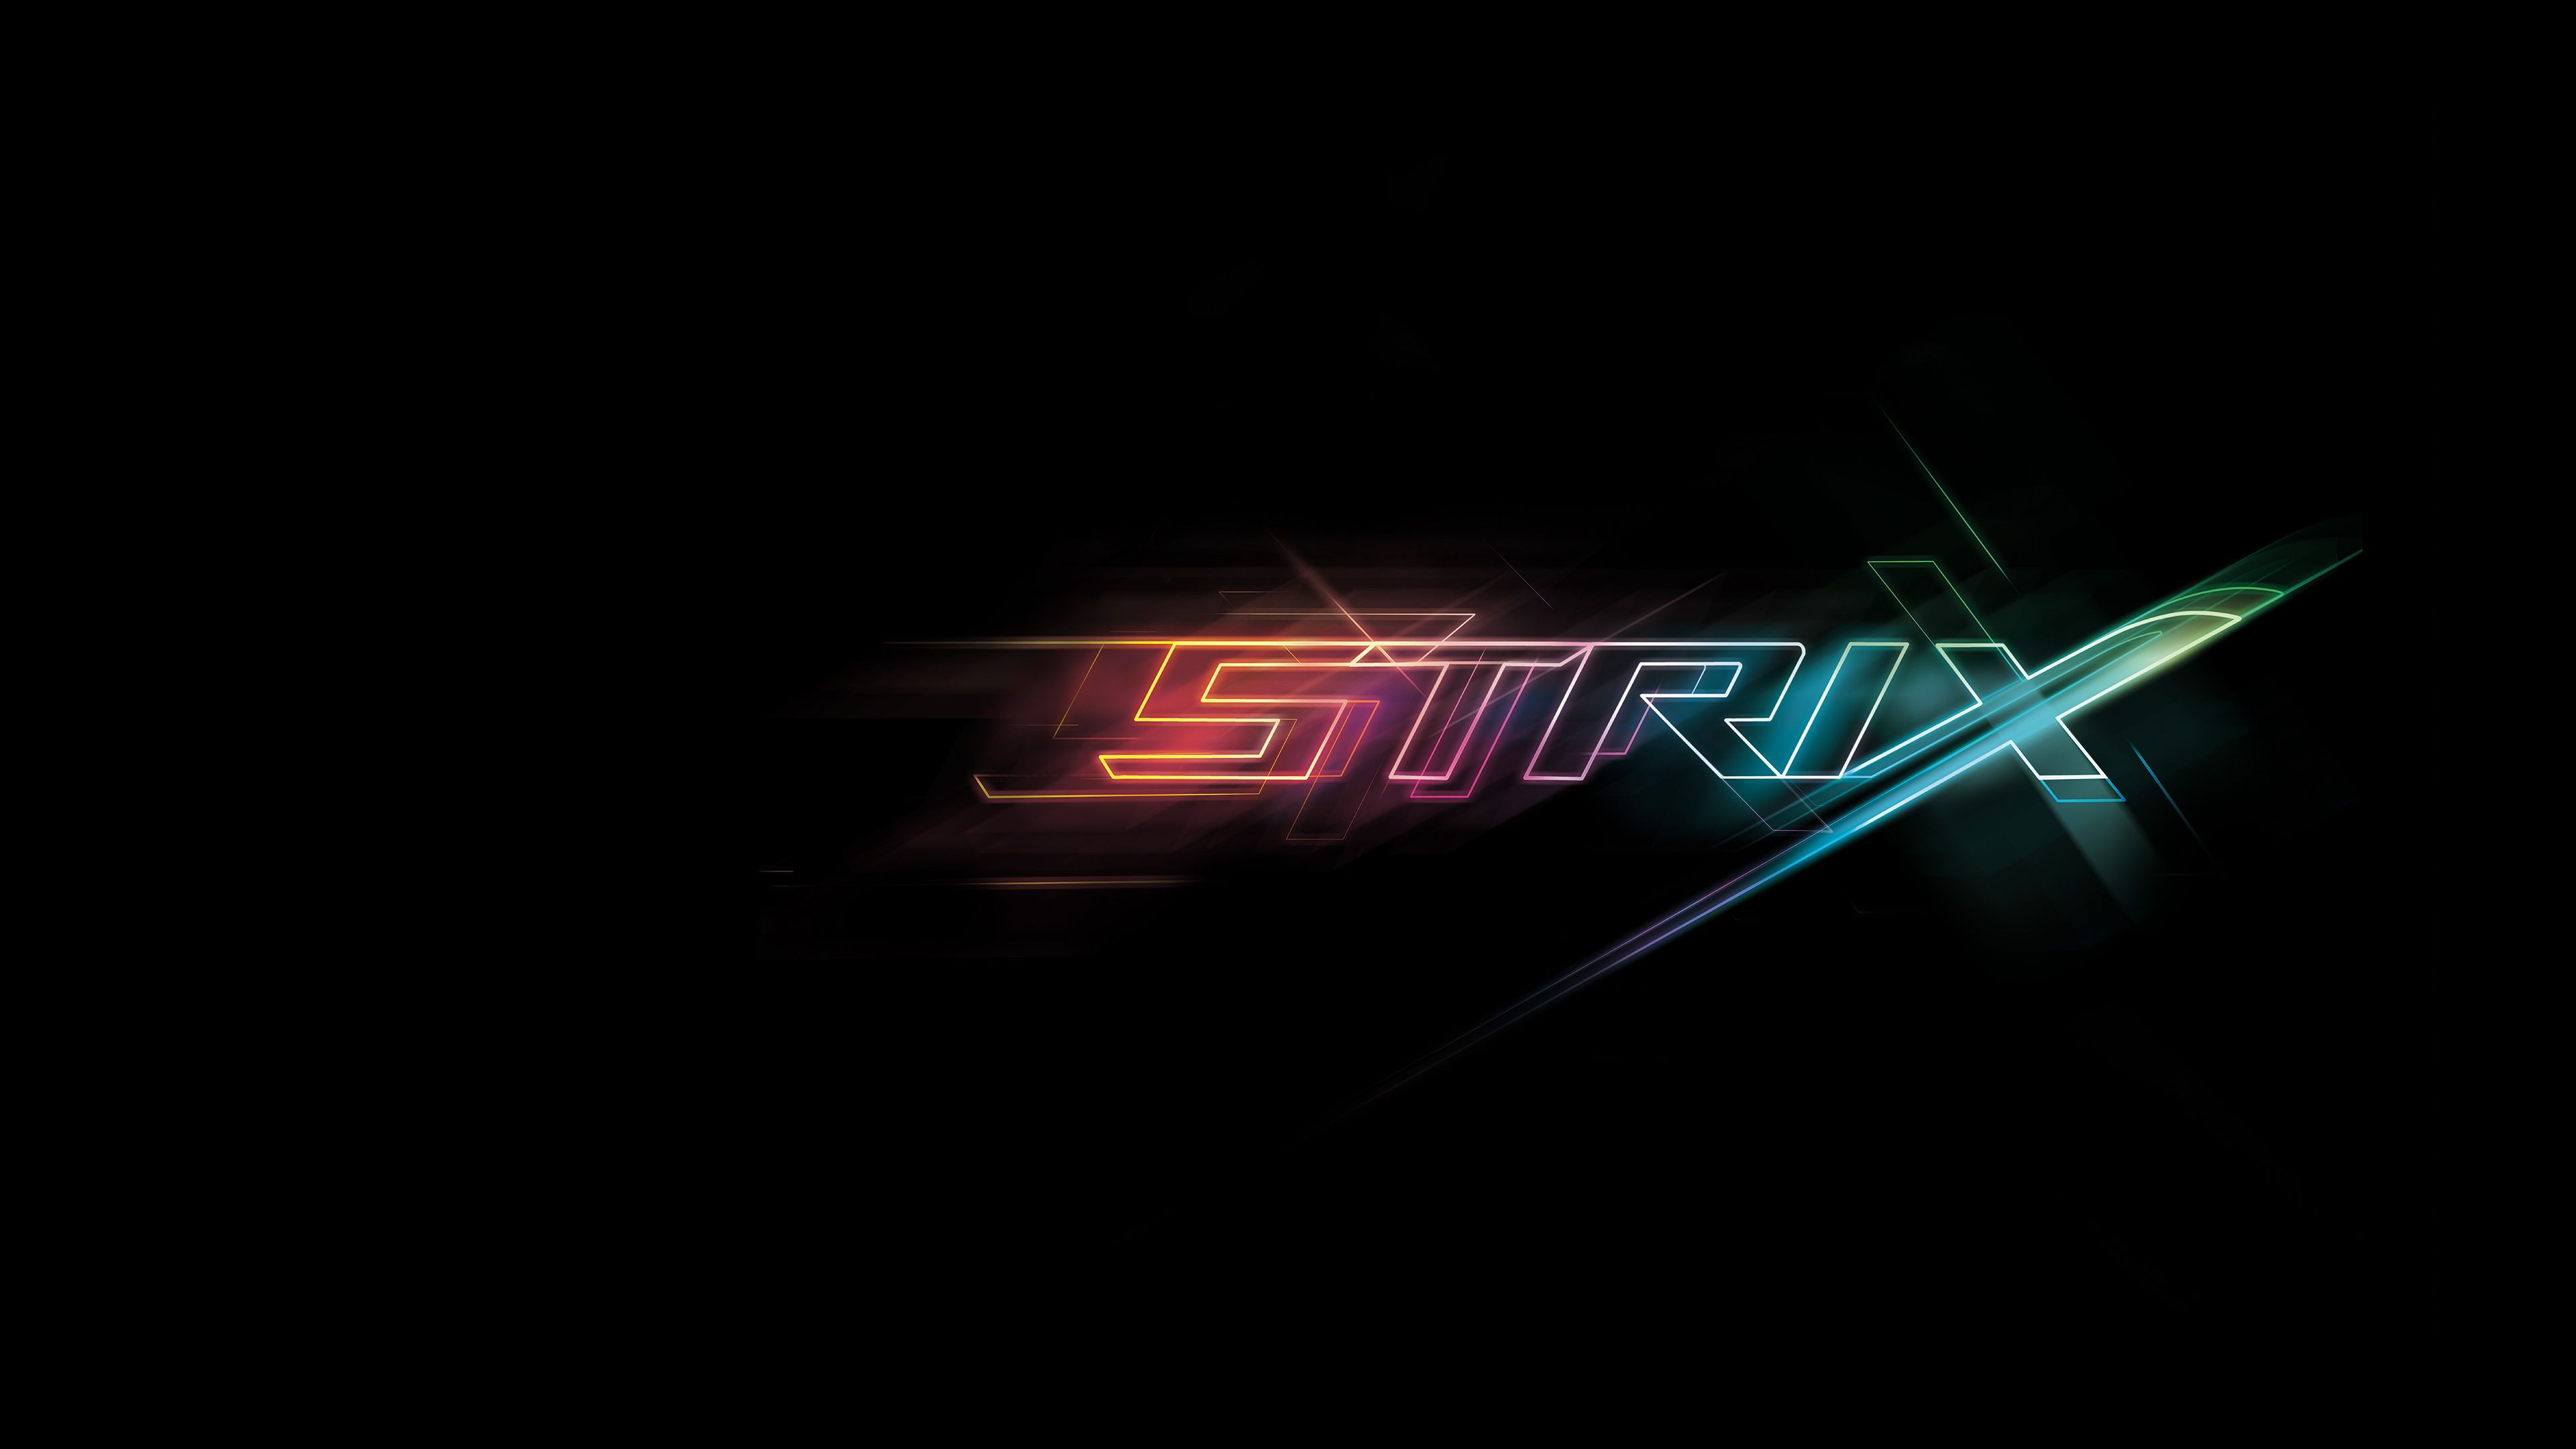 Asus Strix Wallpaper: Top Free Asus 4K Backgrounds